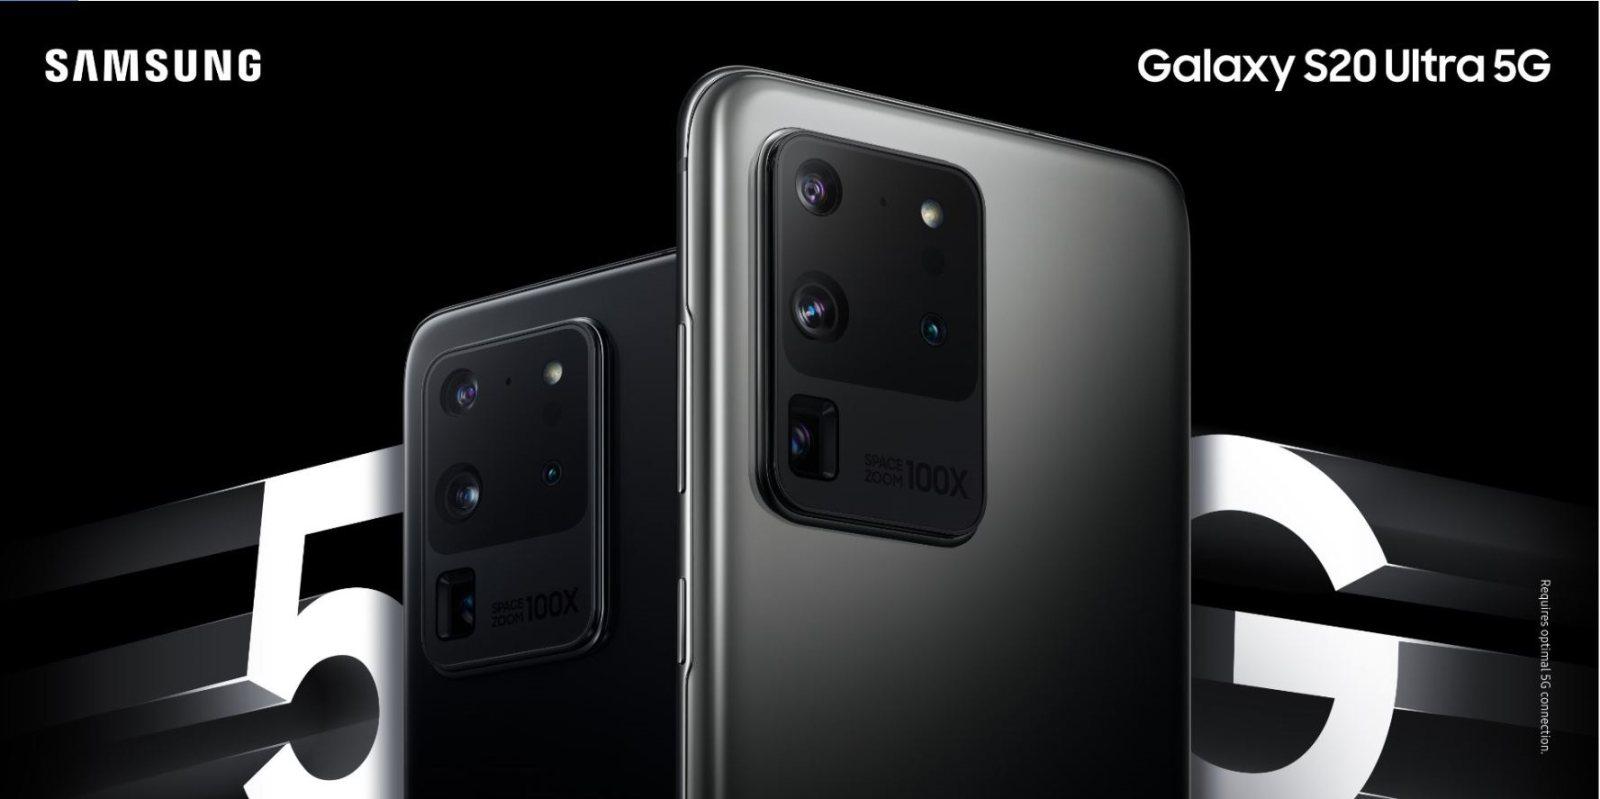 Galaxy S20系列与折叠手机Galaxy Z Flip正式发布